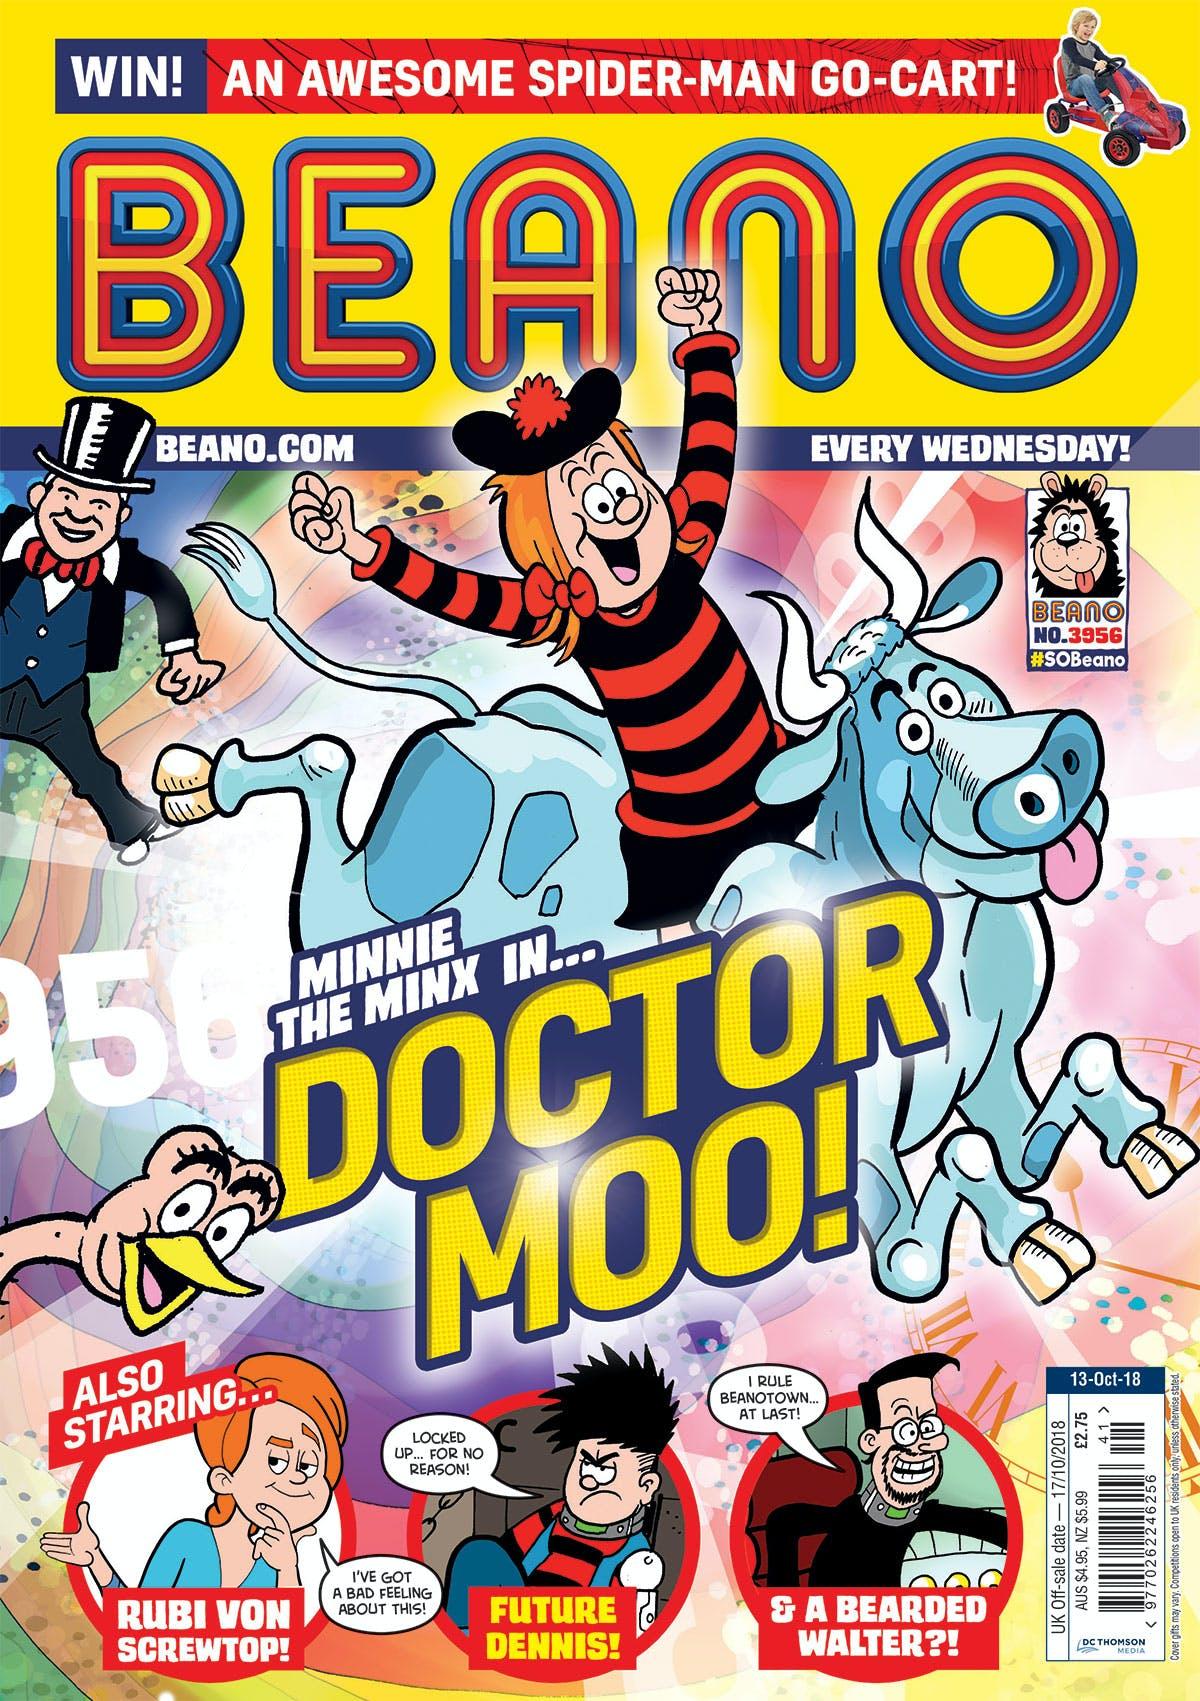 Inside Beano 3956 - Doctor Moo!?